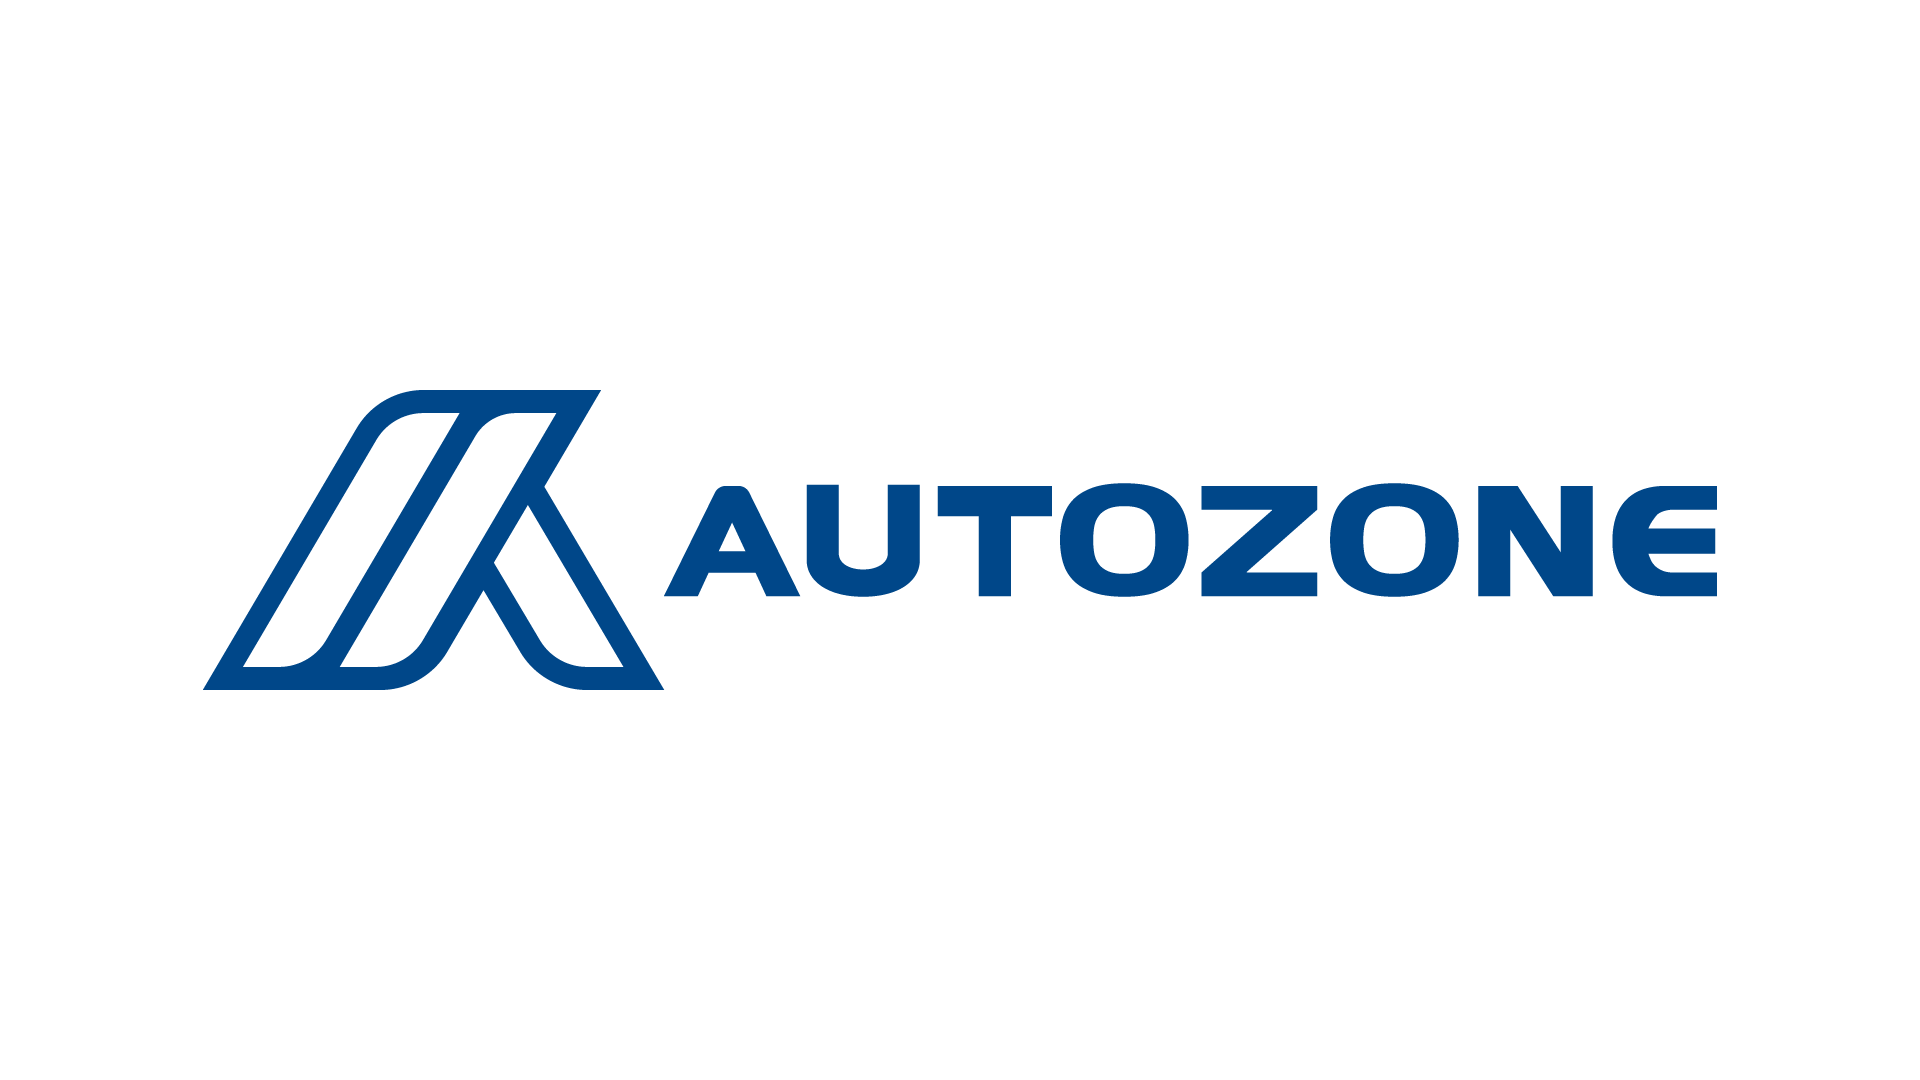 Autozone secondary logo